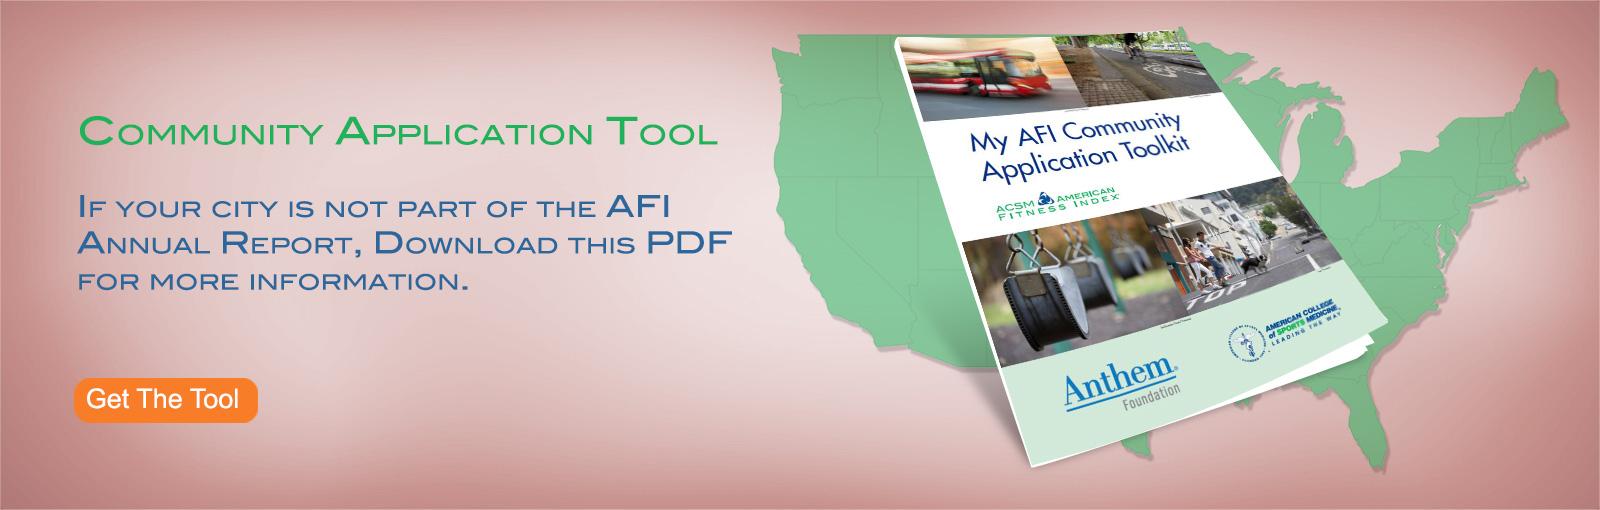 My AFI Community Application Tool